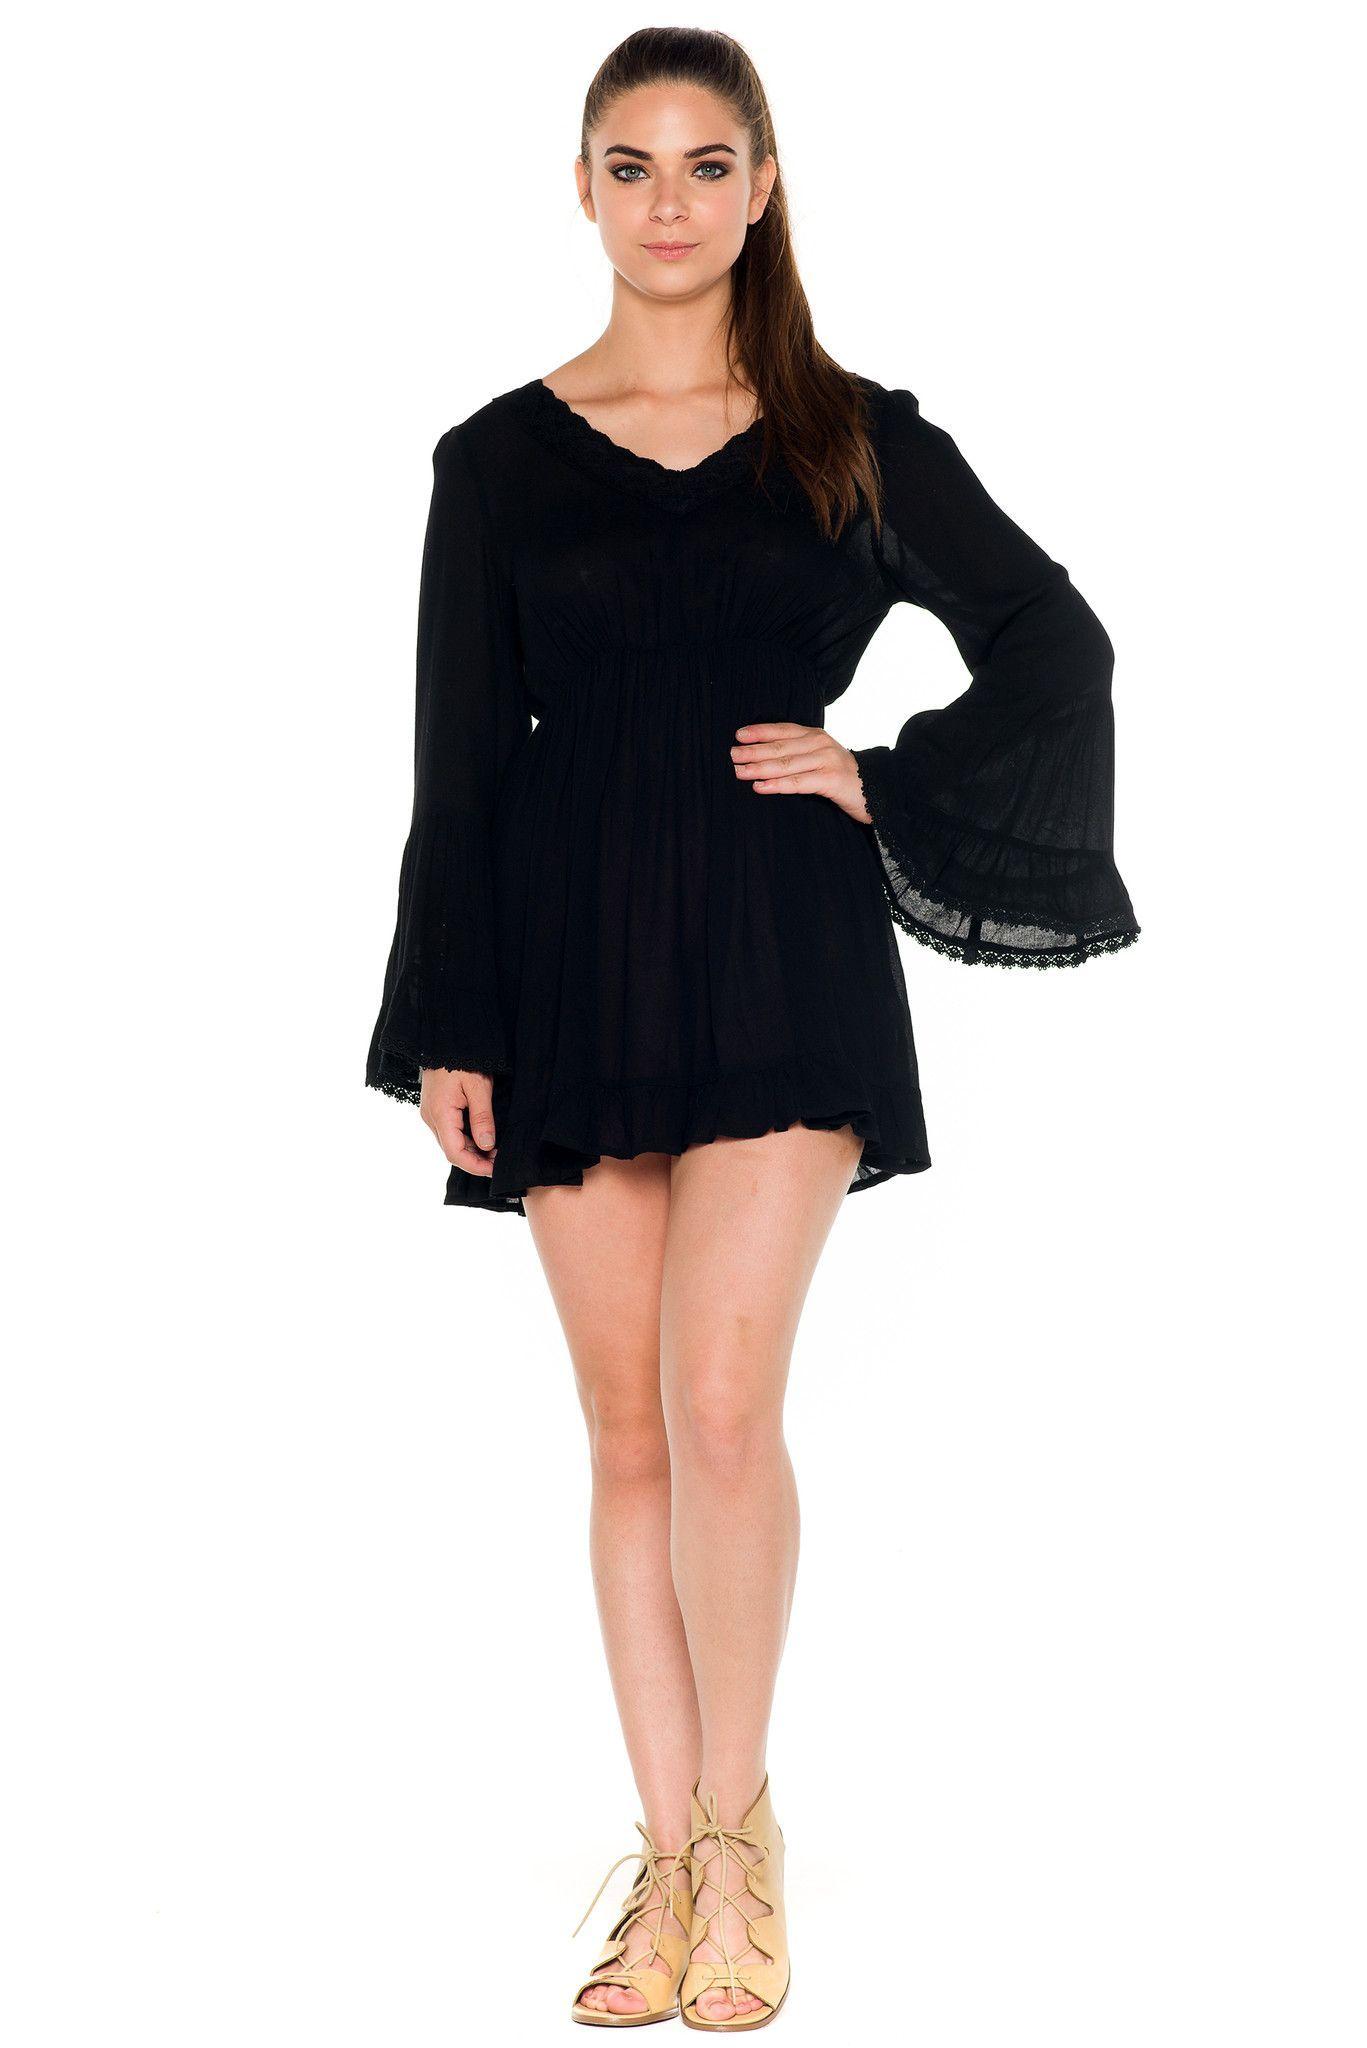 Ala bell sleeves flare short dress black products pinterest